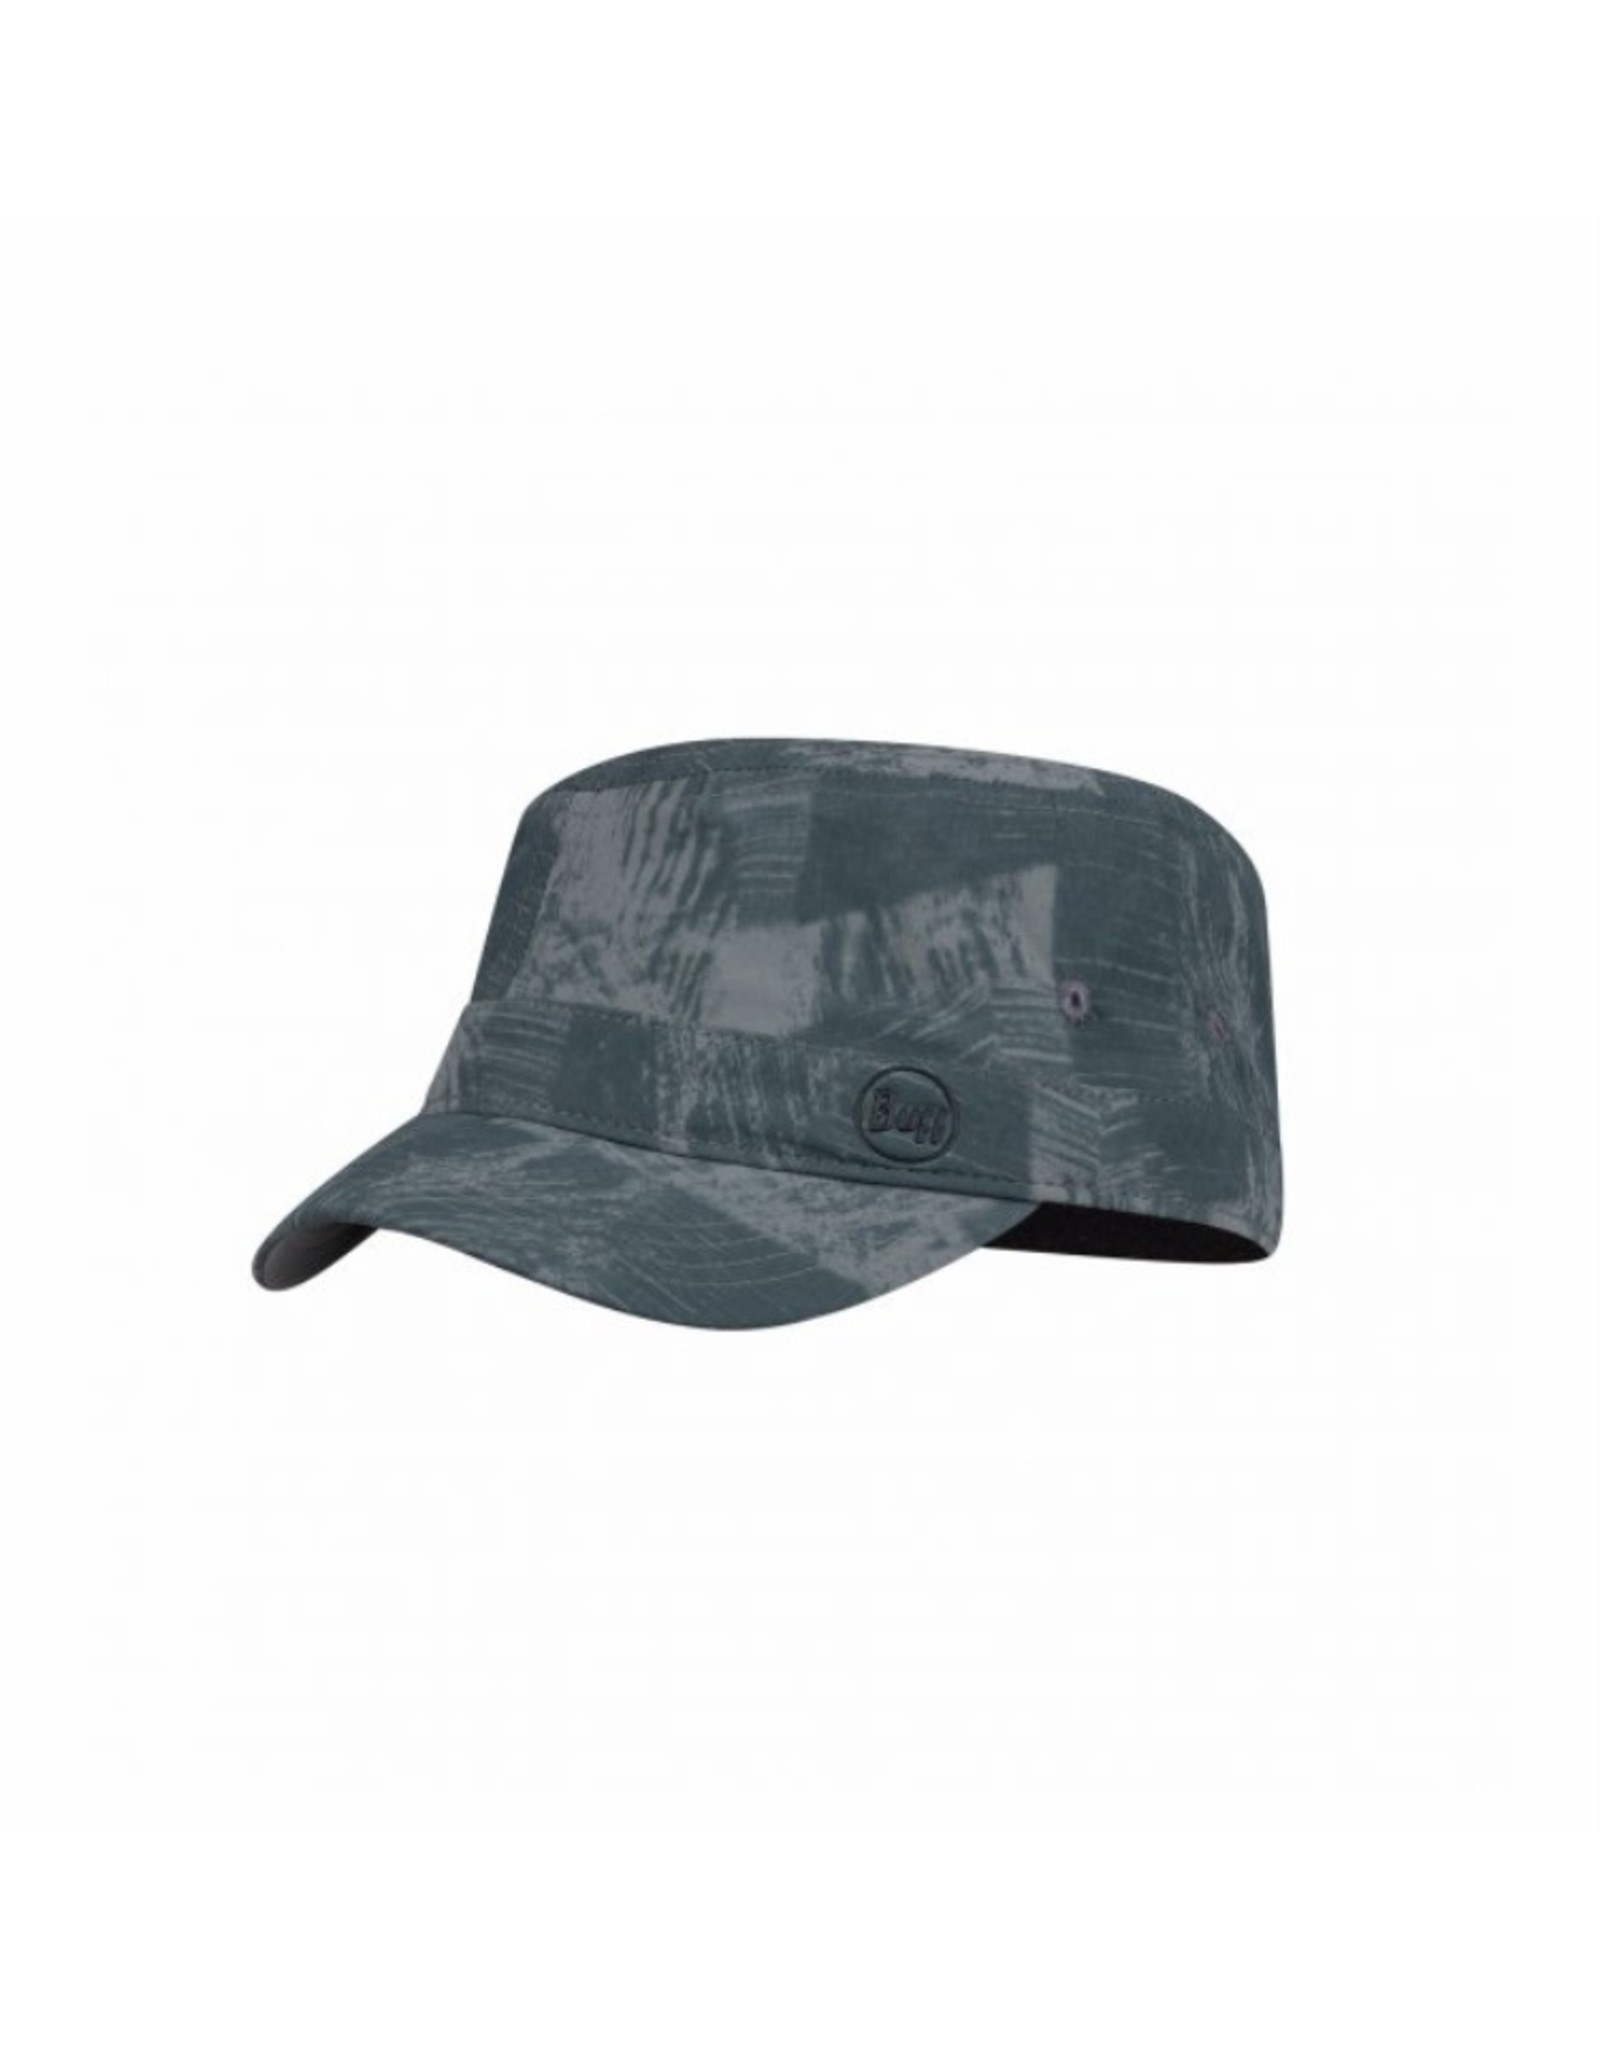 Buff Buff Military Cap Rinmann Pewter Grey S/M